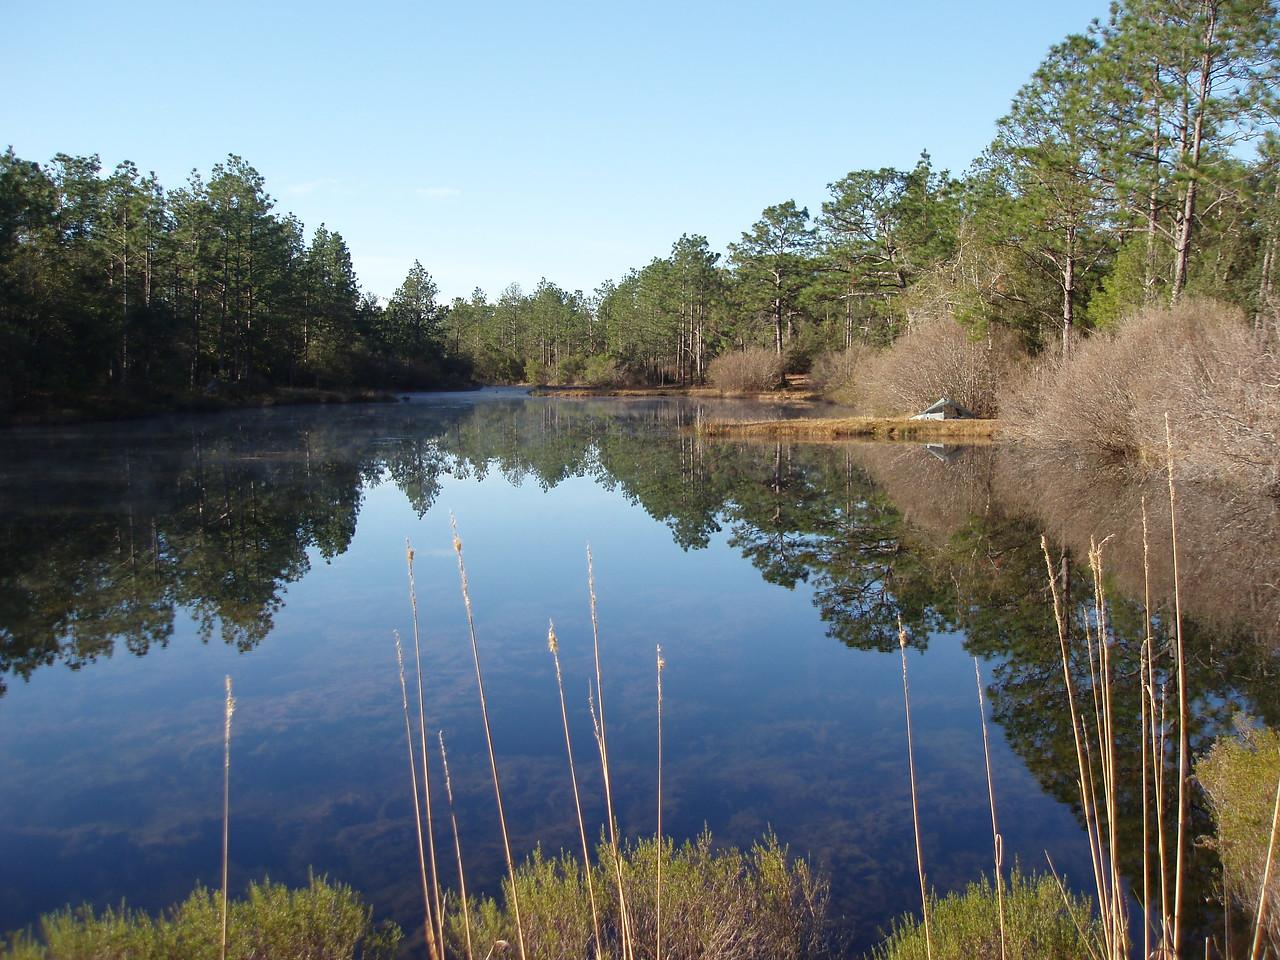 Camping at JR Walton Pond, Eglin AFB<br /> PHOTO CREDIT: Robert Coveney / Florida Trail Association